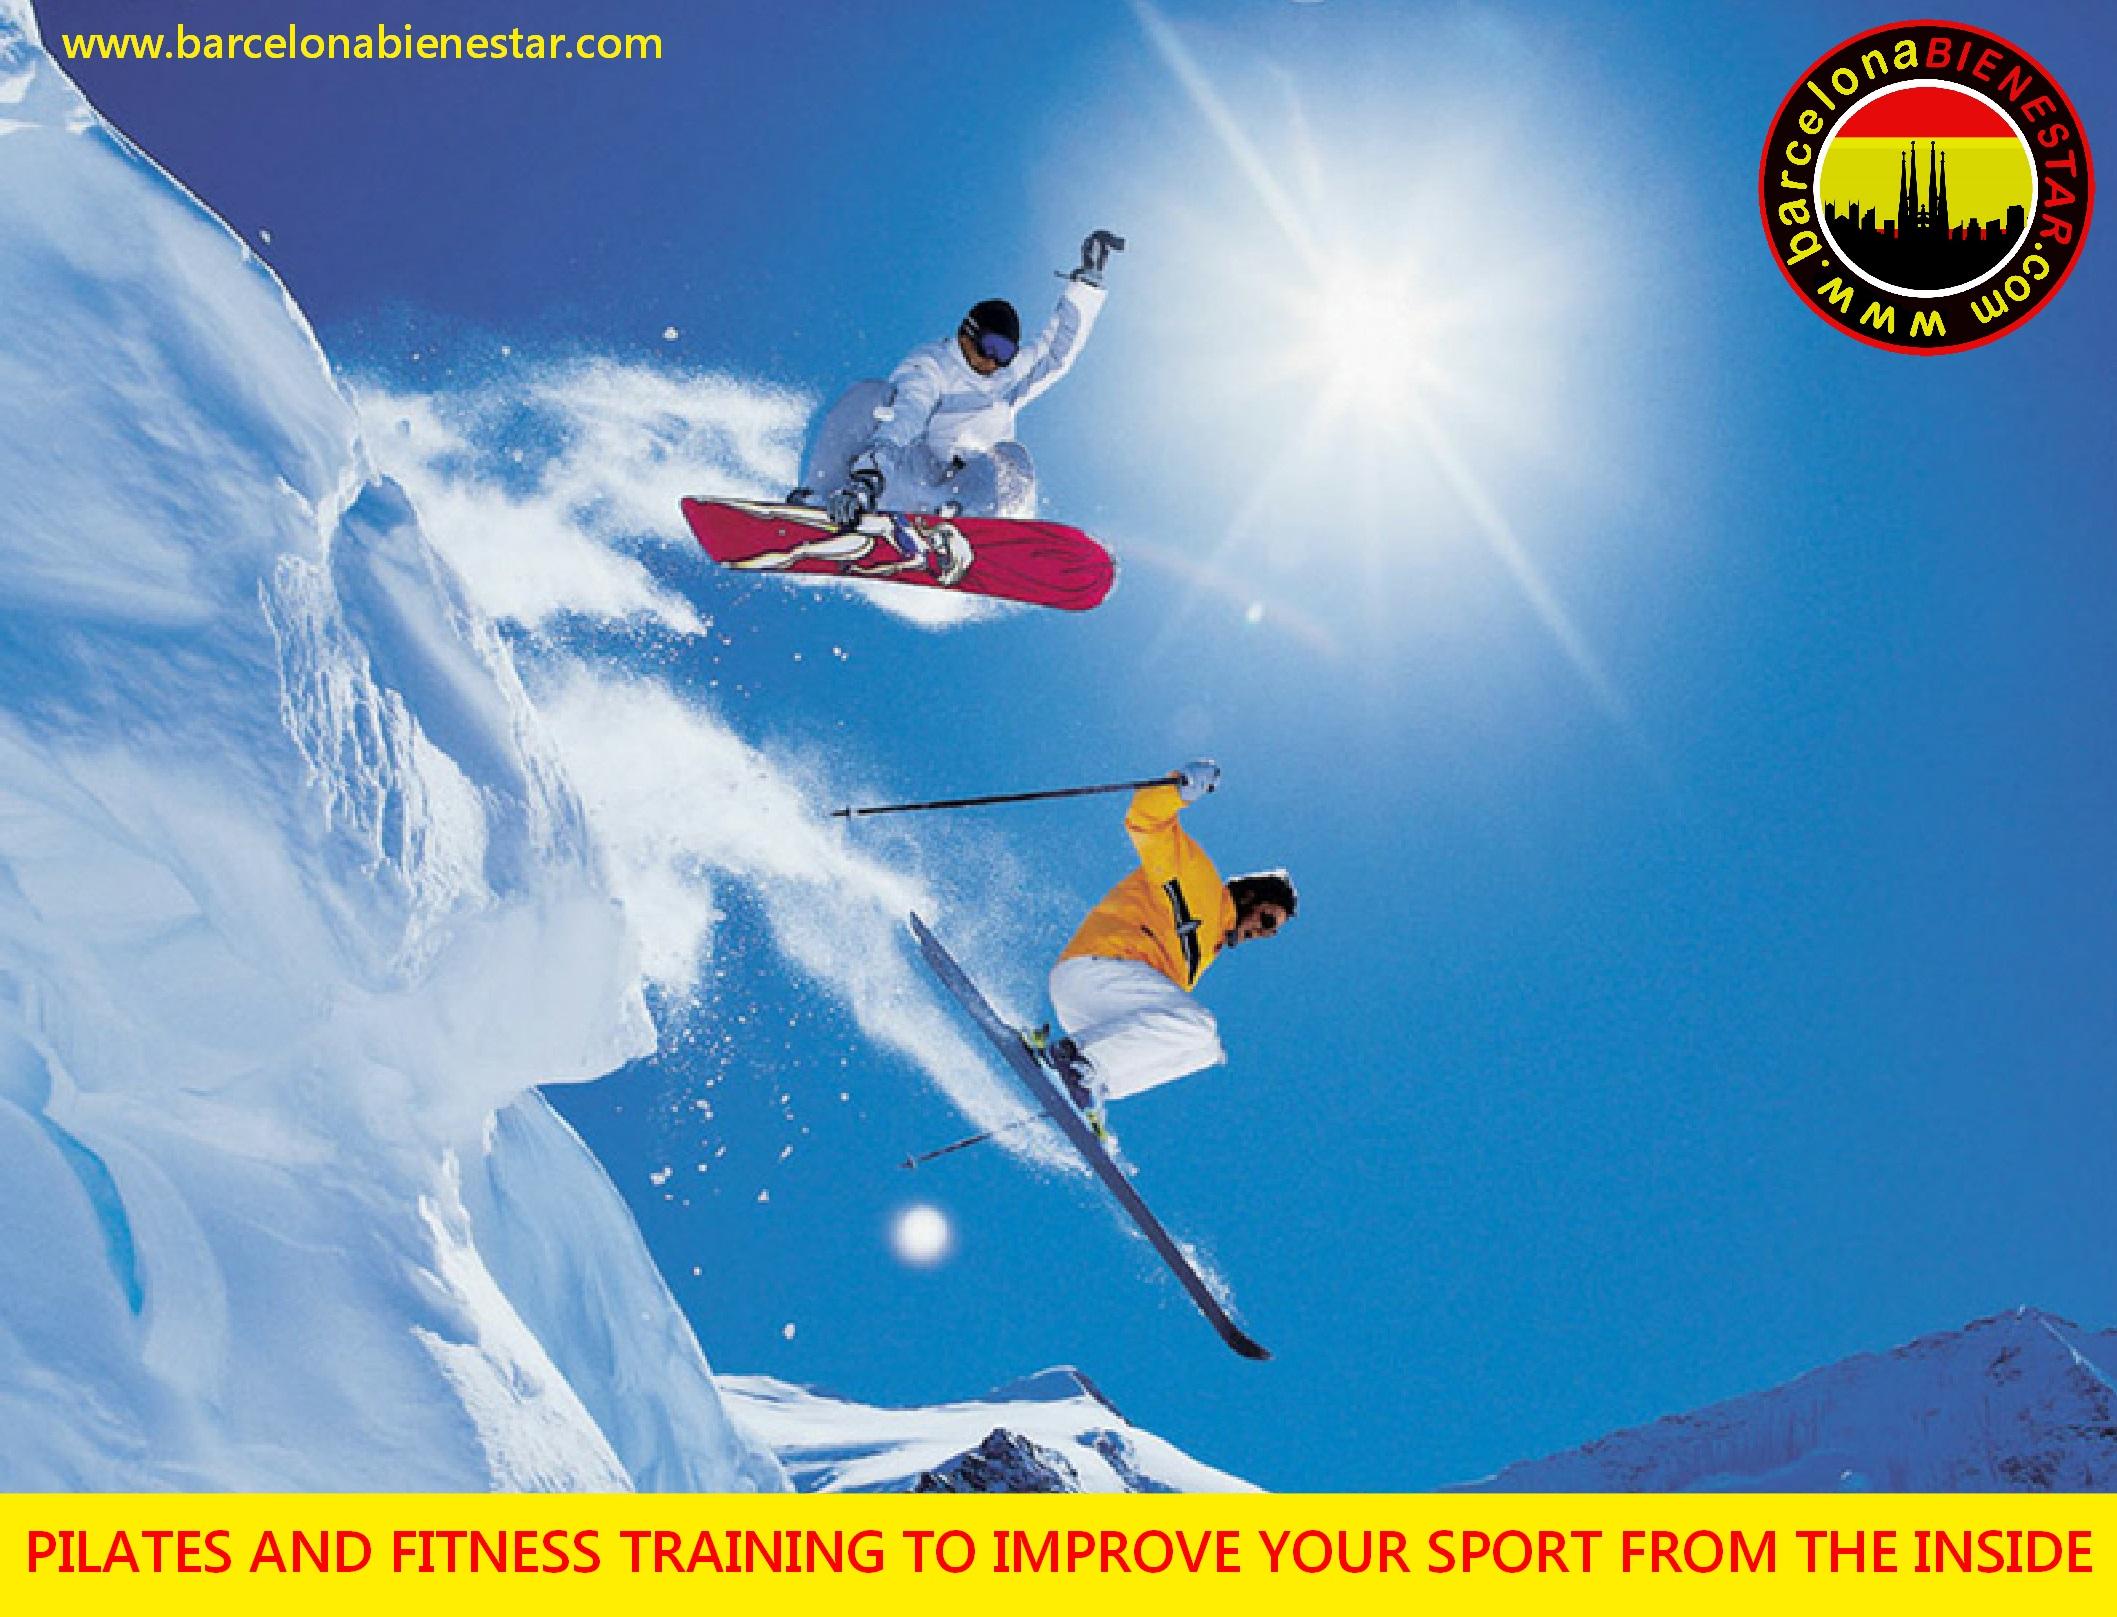 Pilates fitness skiing snowbaording barcelona bienestar